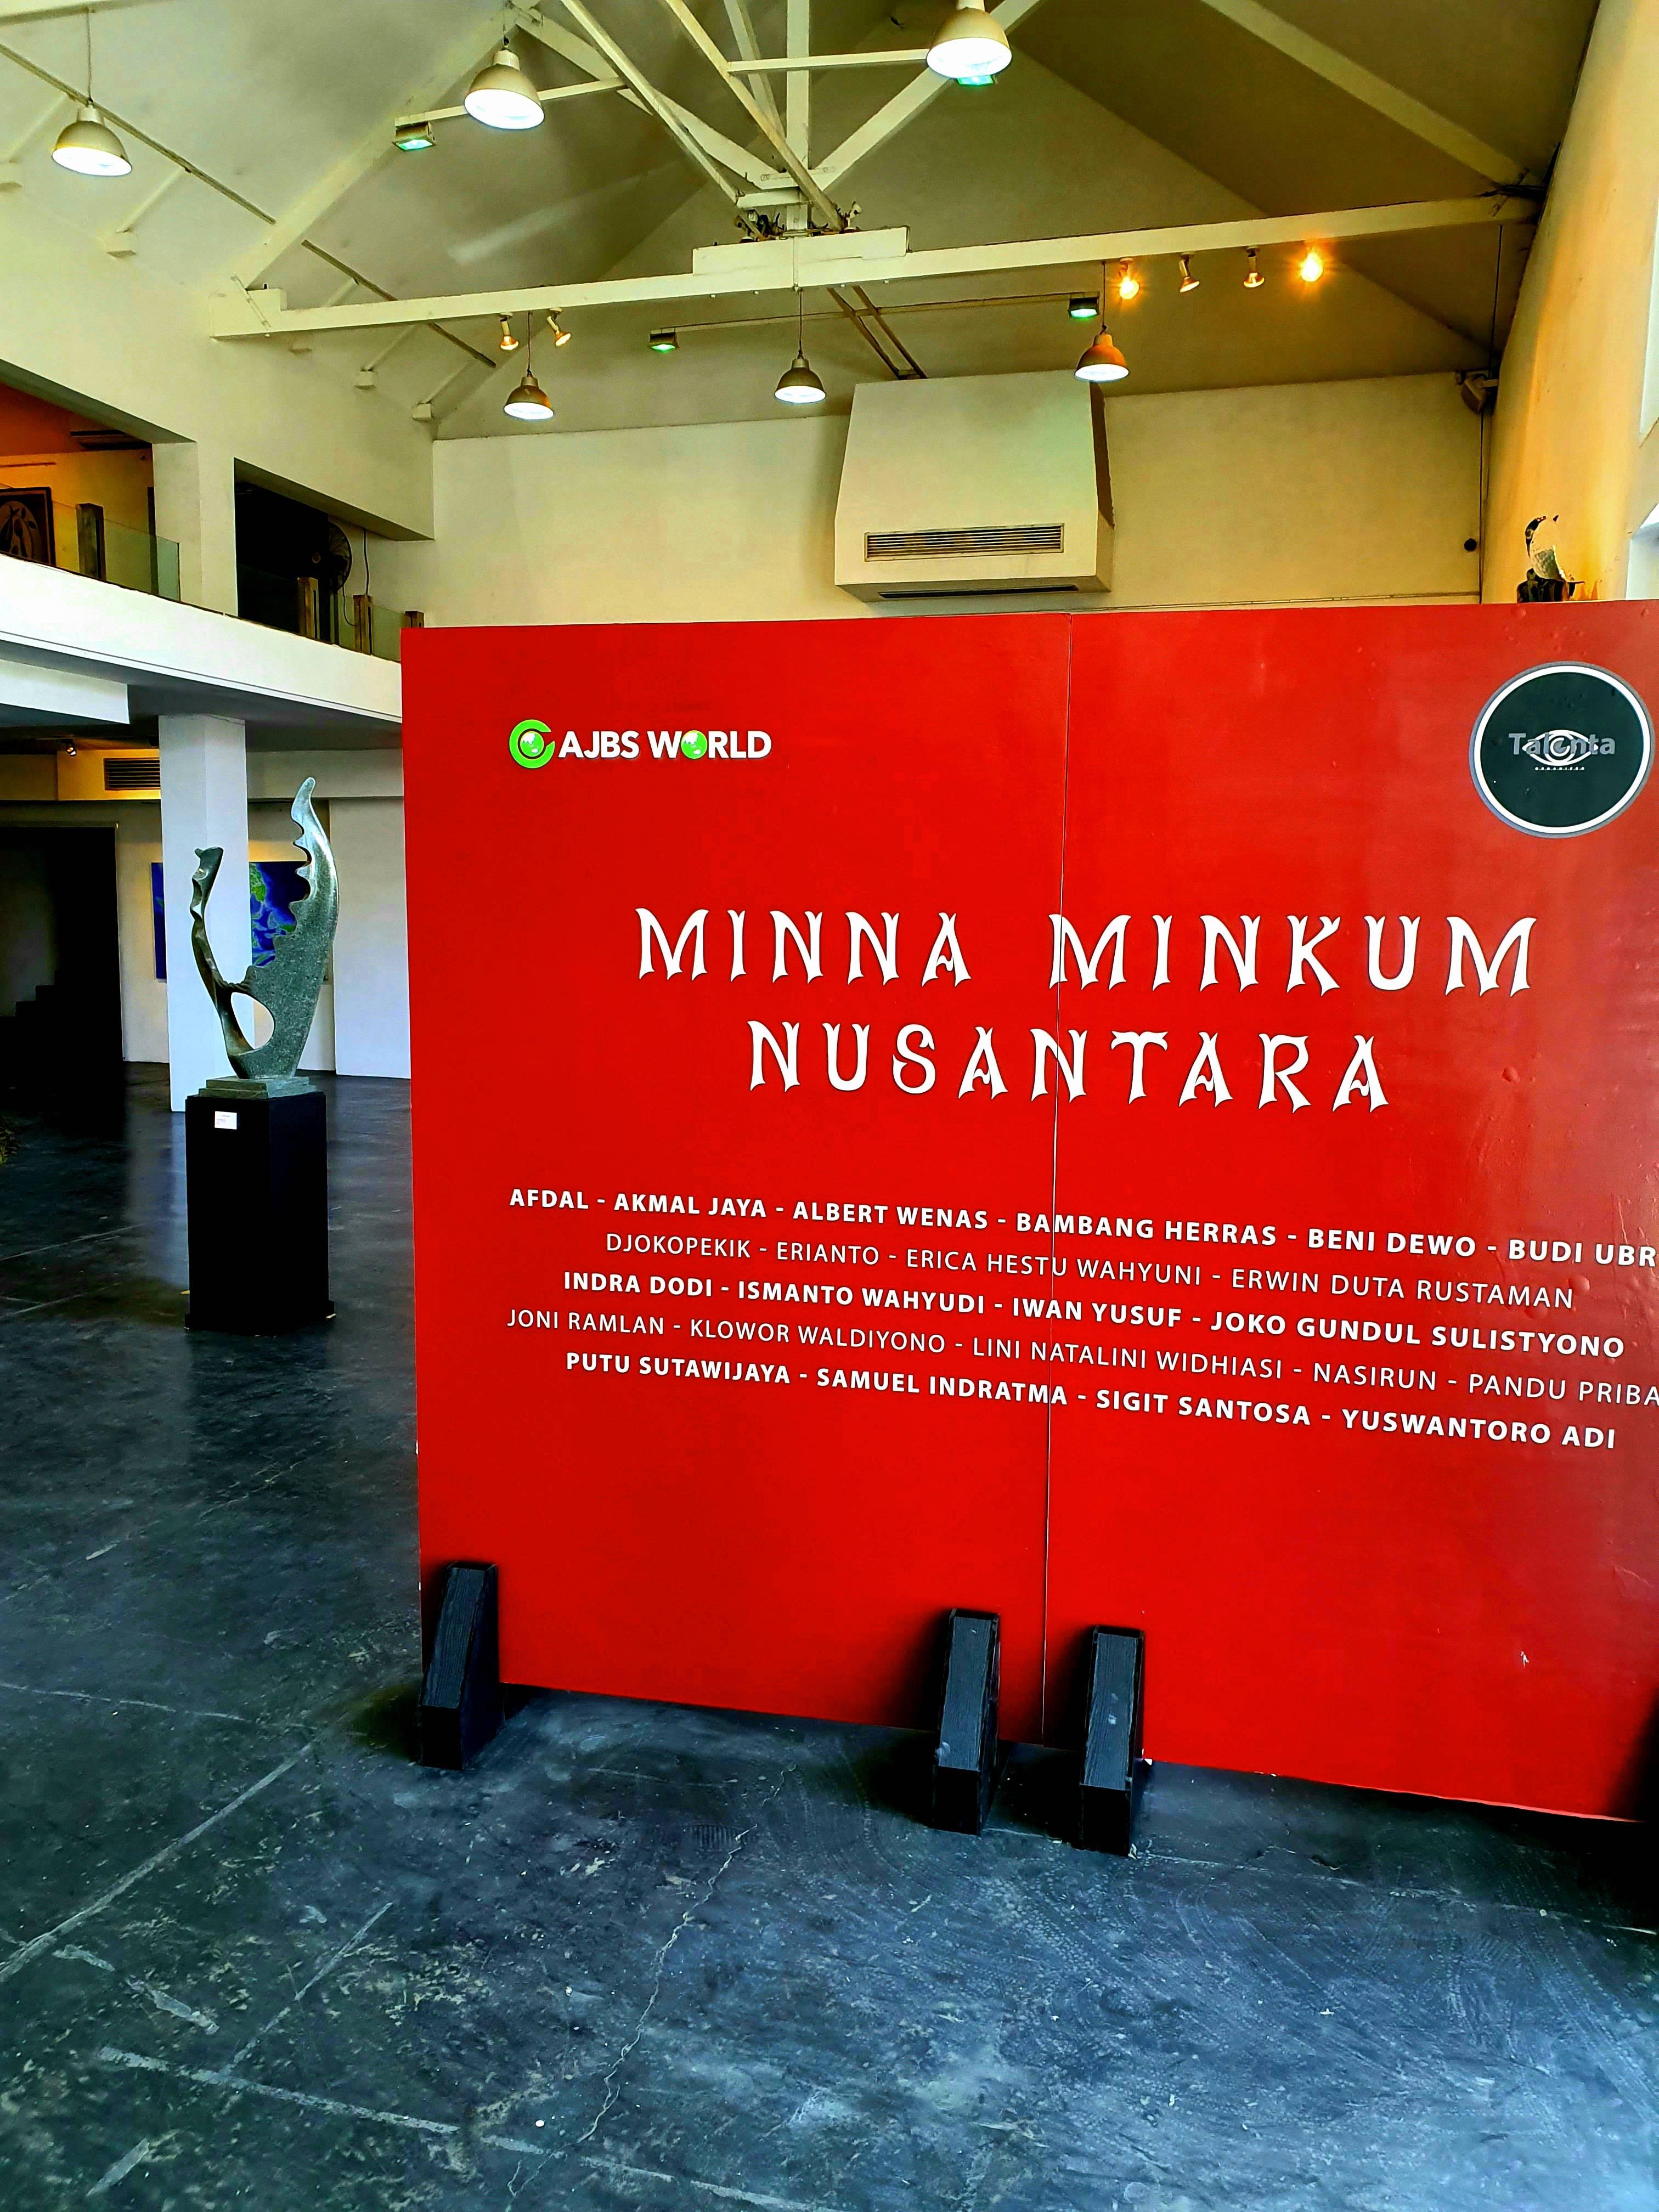 Minna Mingkum Nusantara